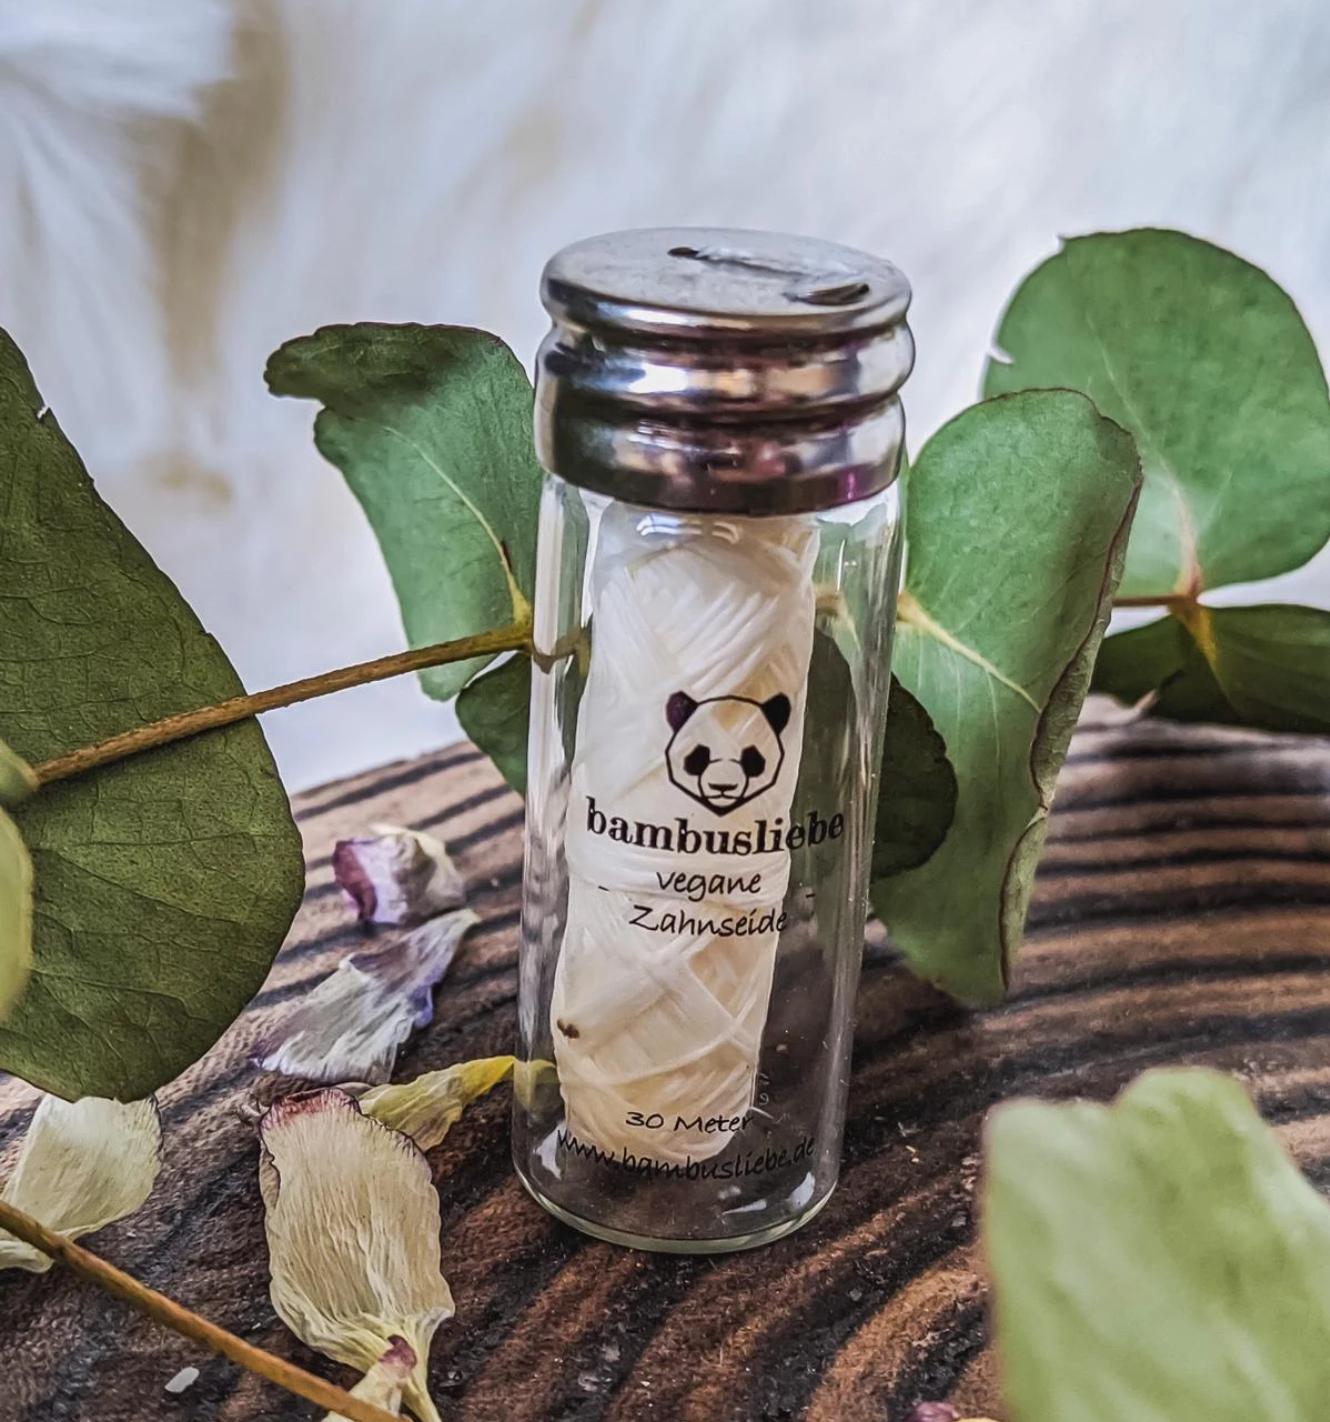 Zahnseide, vegan von Bambusliebe